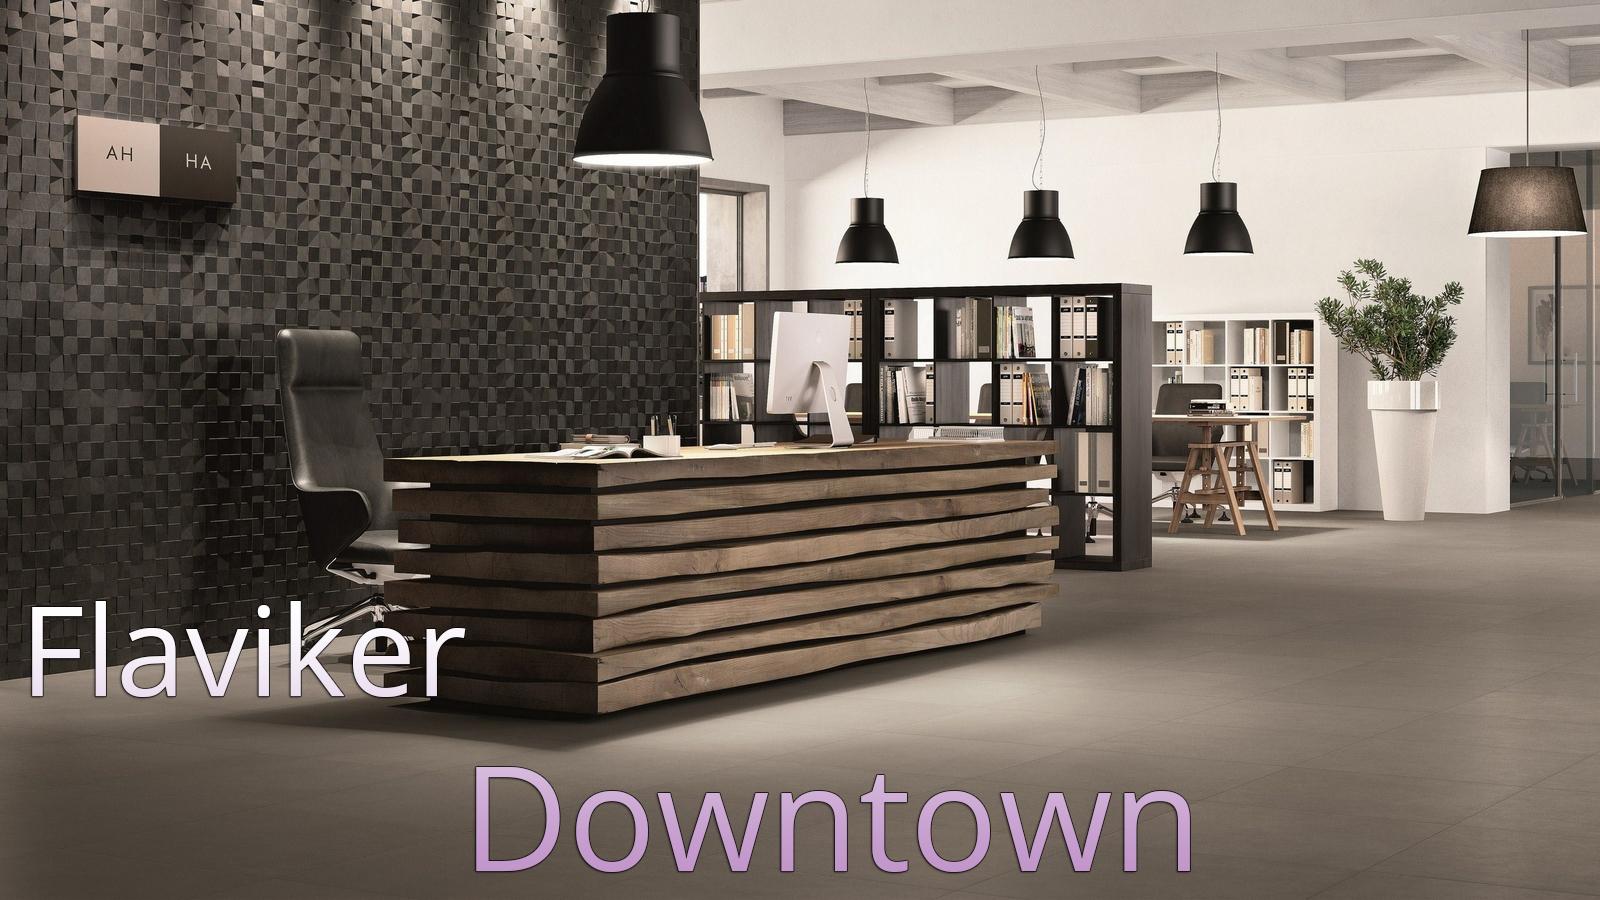 Flaviker - Downtown